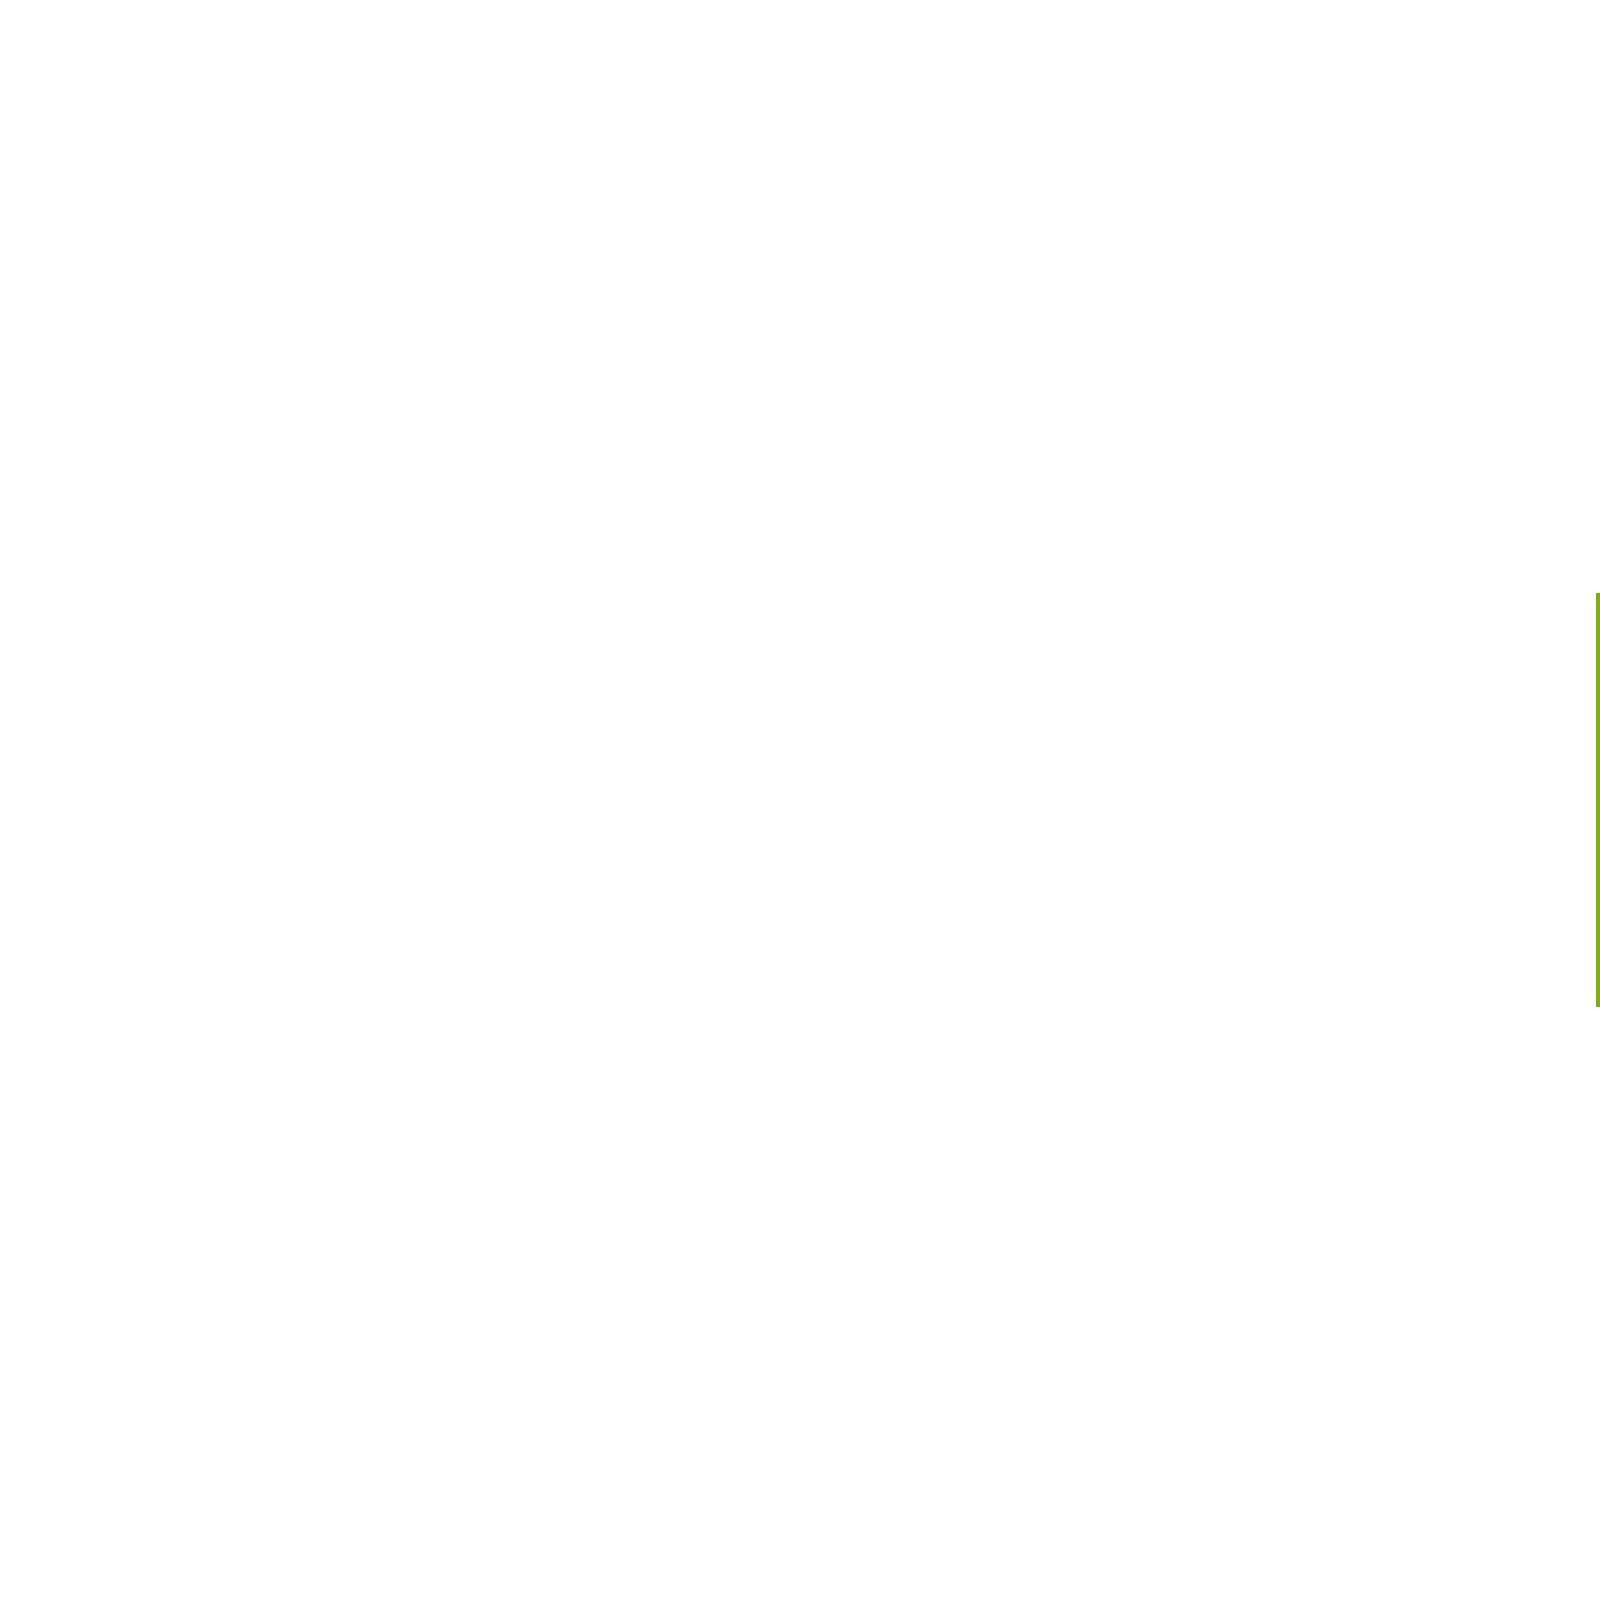 Wal-Mart Challenge Coin WalMart Challenge Coin